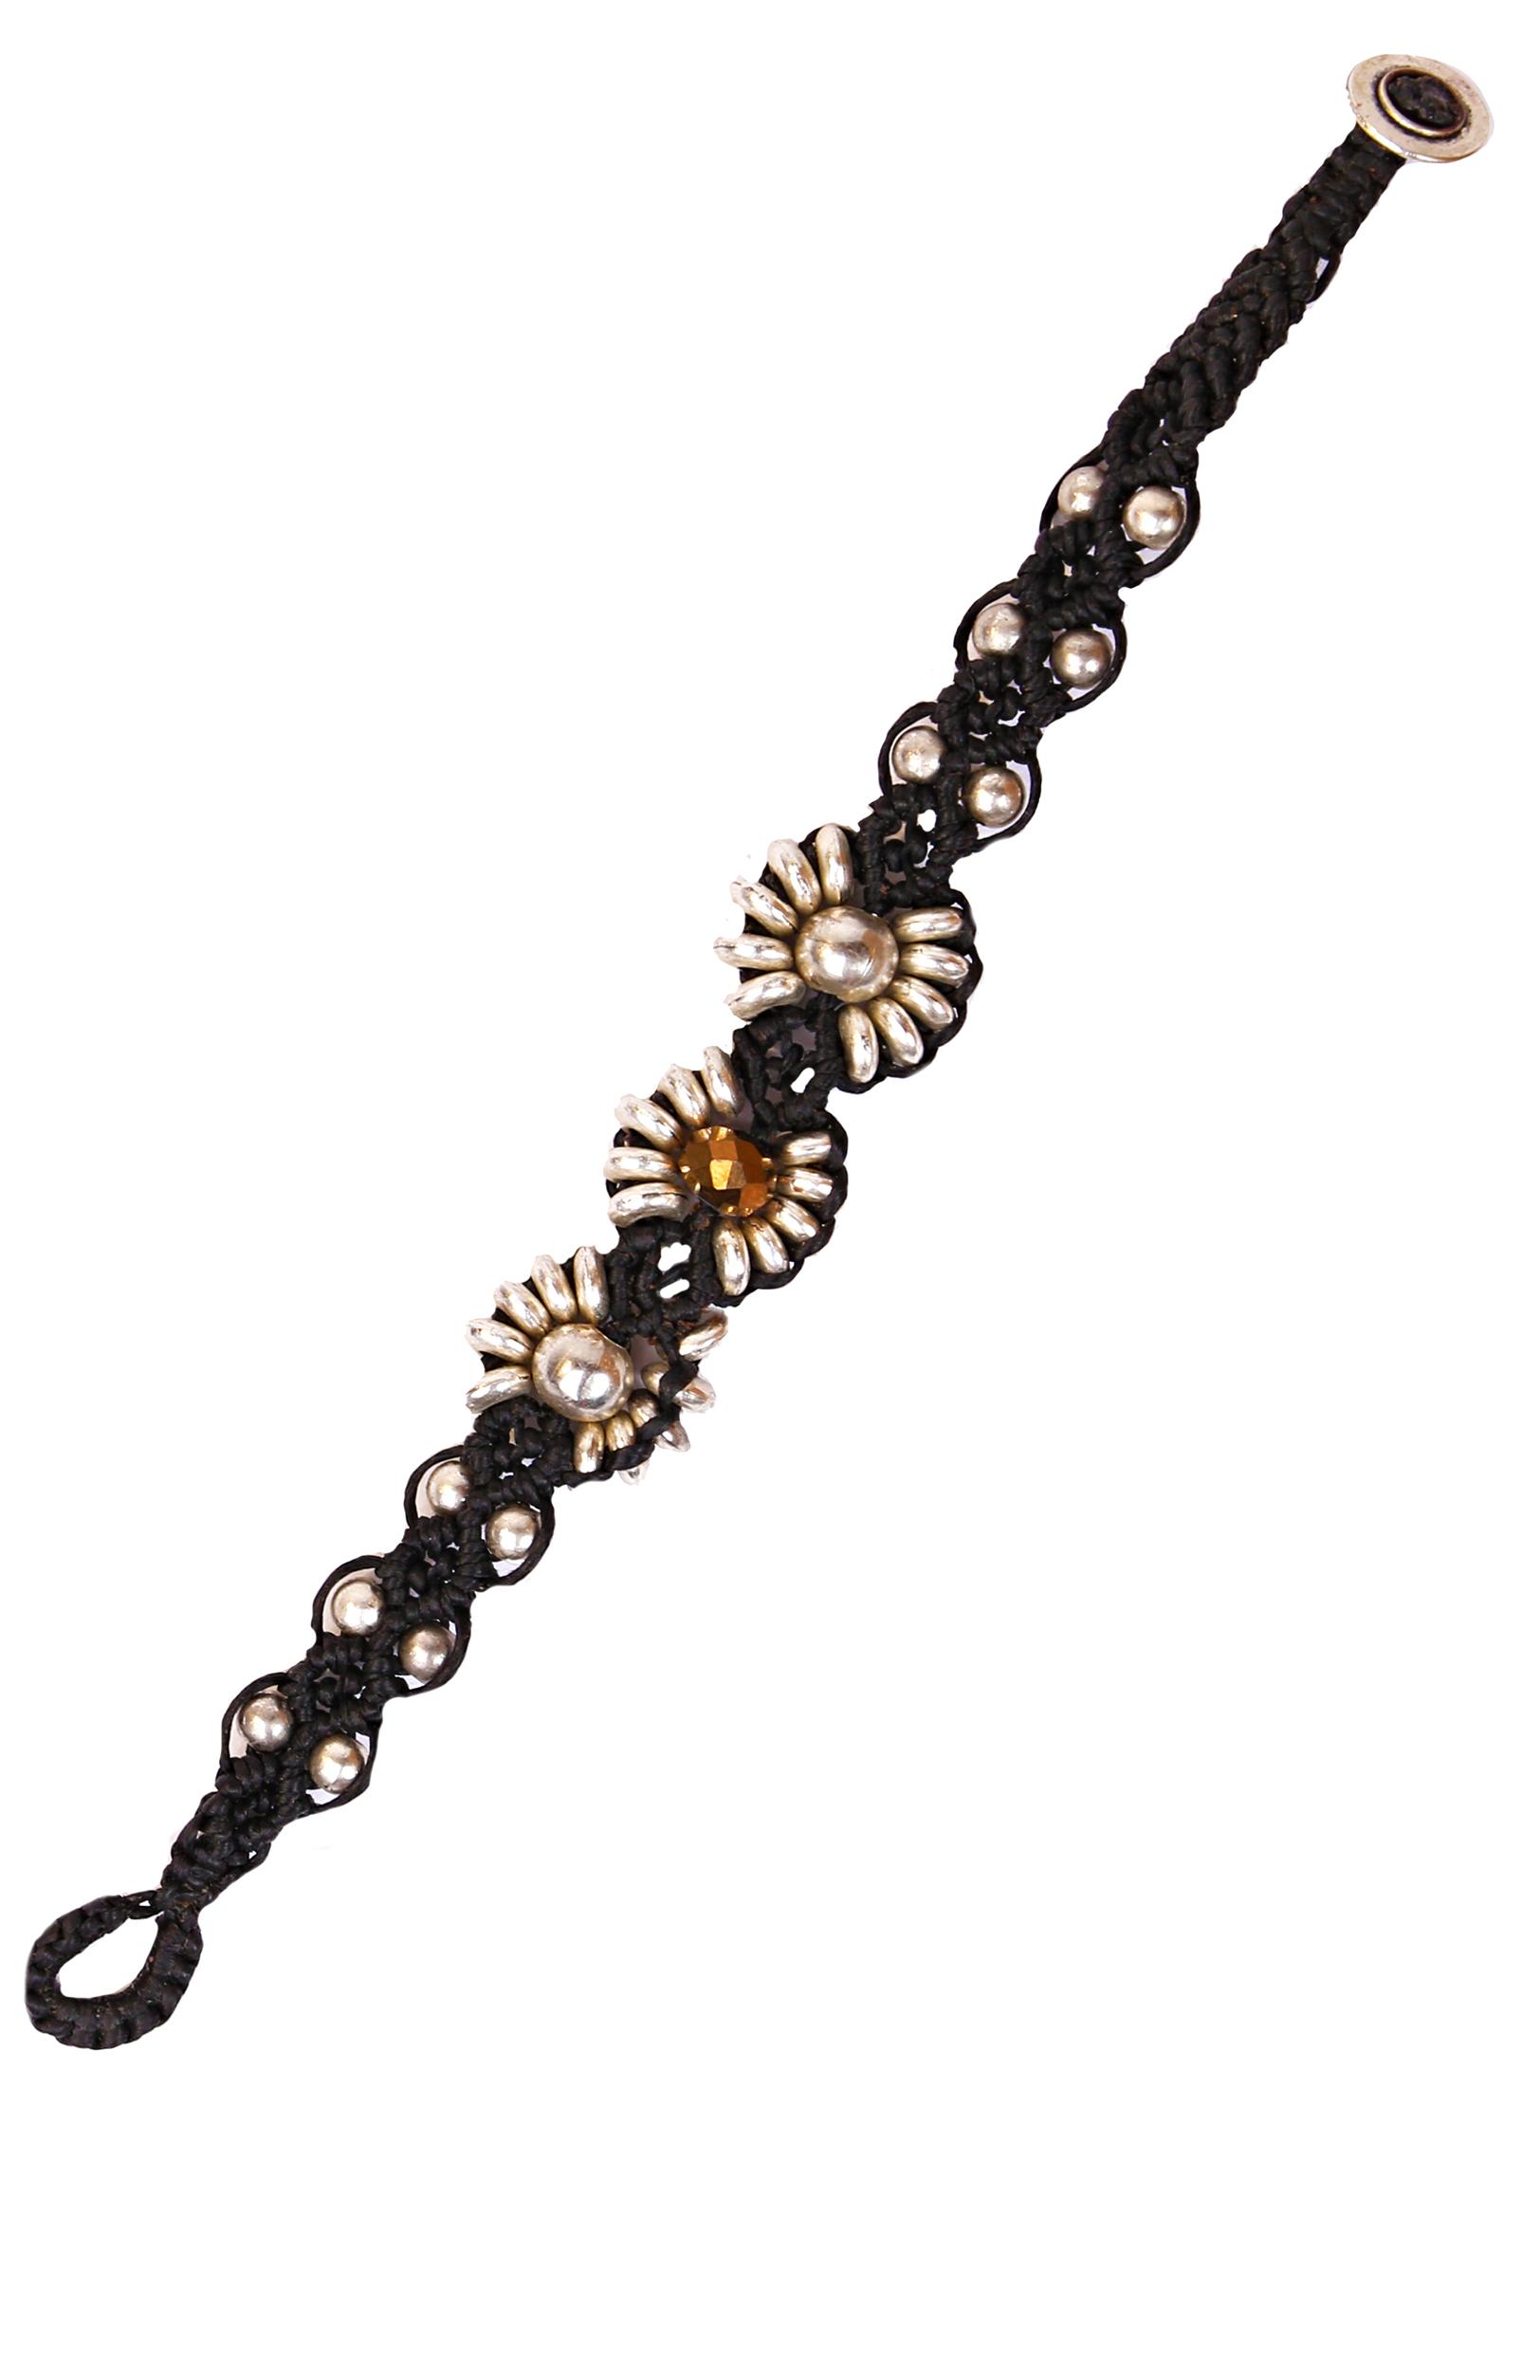 glass-n-metal-macrame-bracelet.jpg